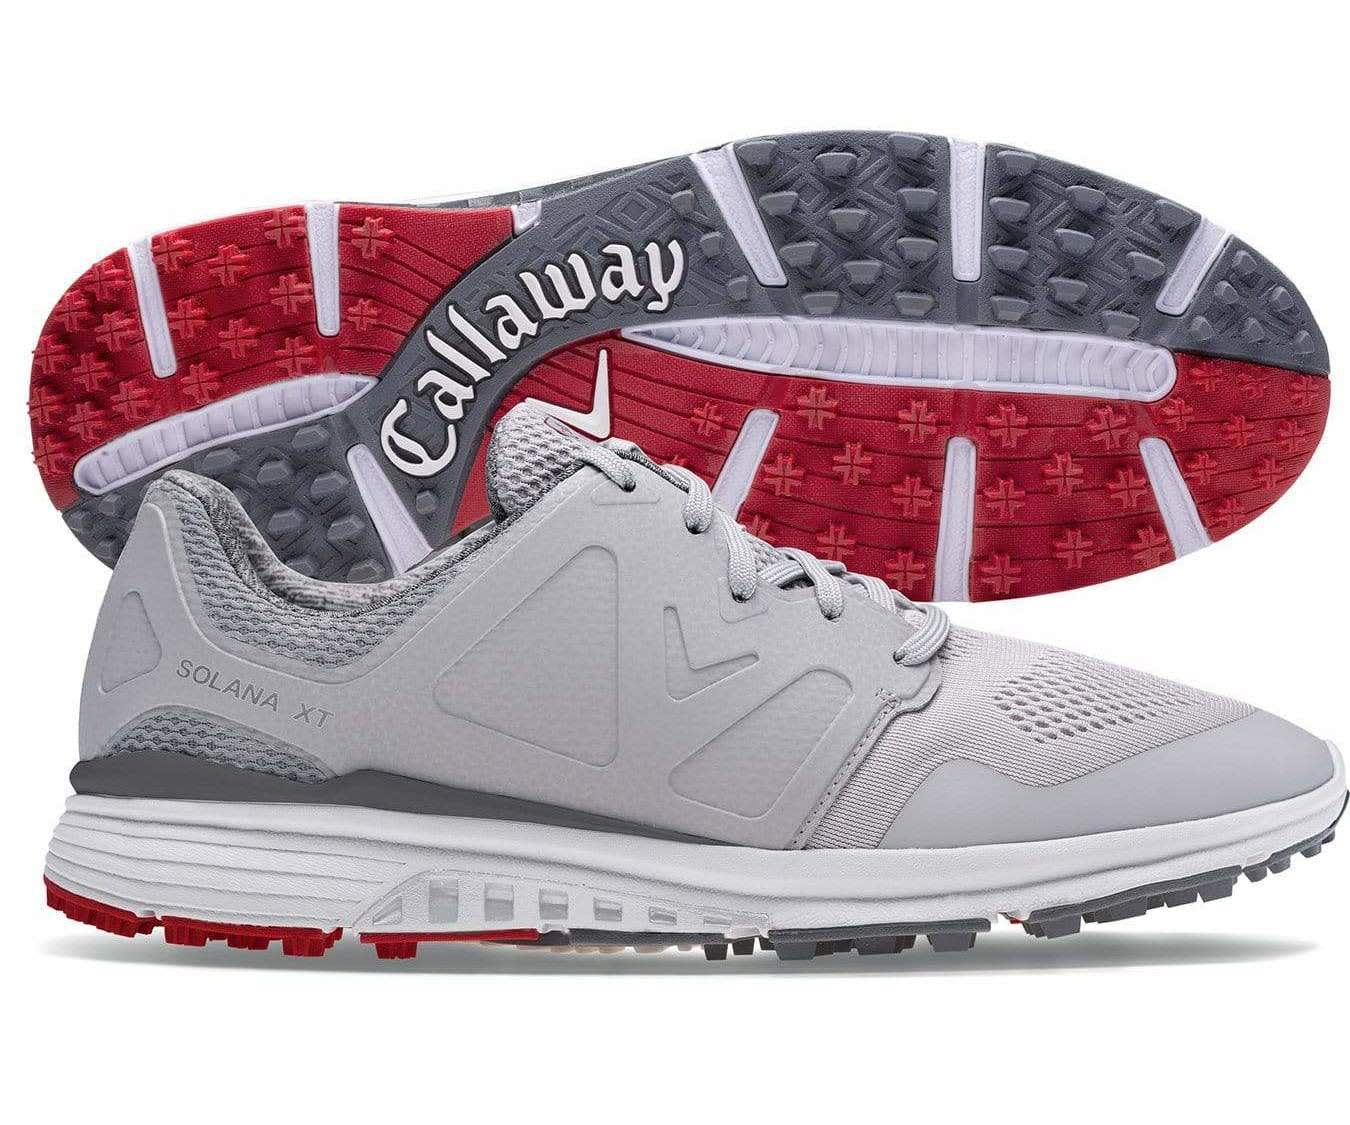 Callaway Men's and Women's Golf Shoes